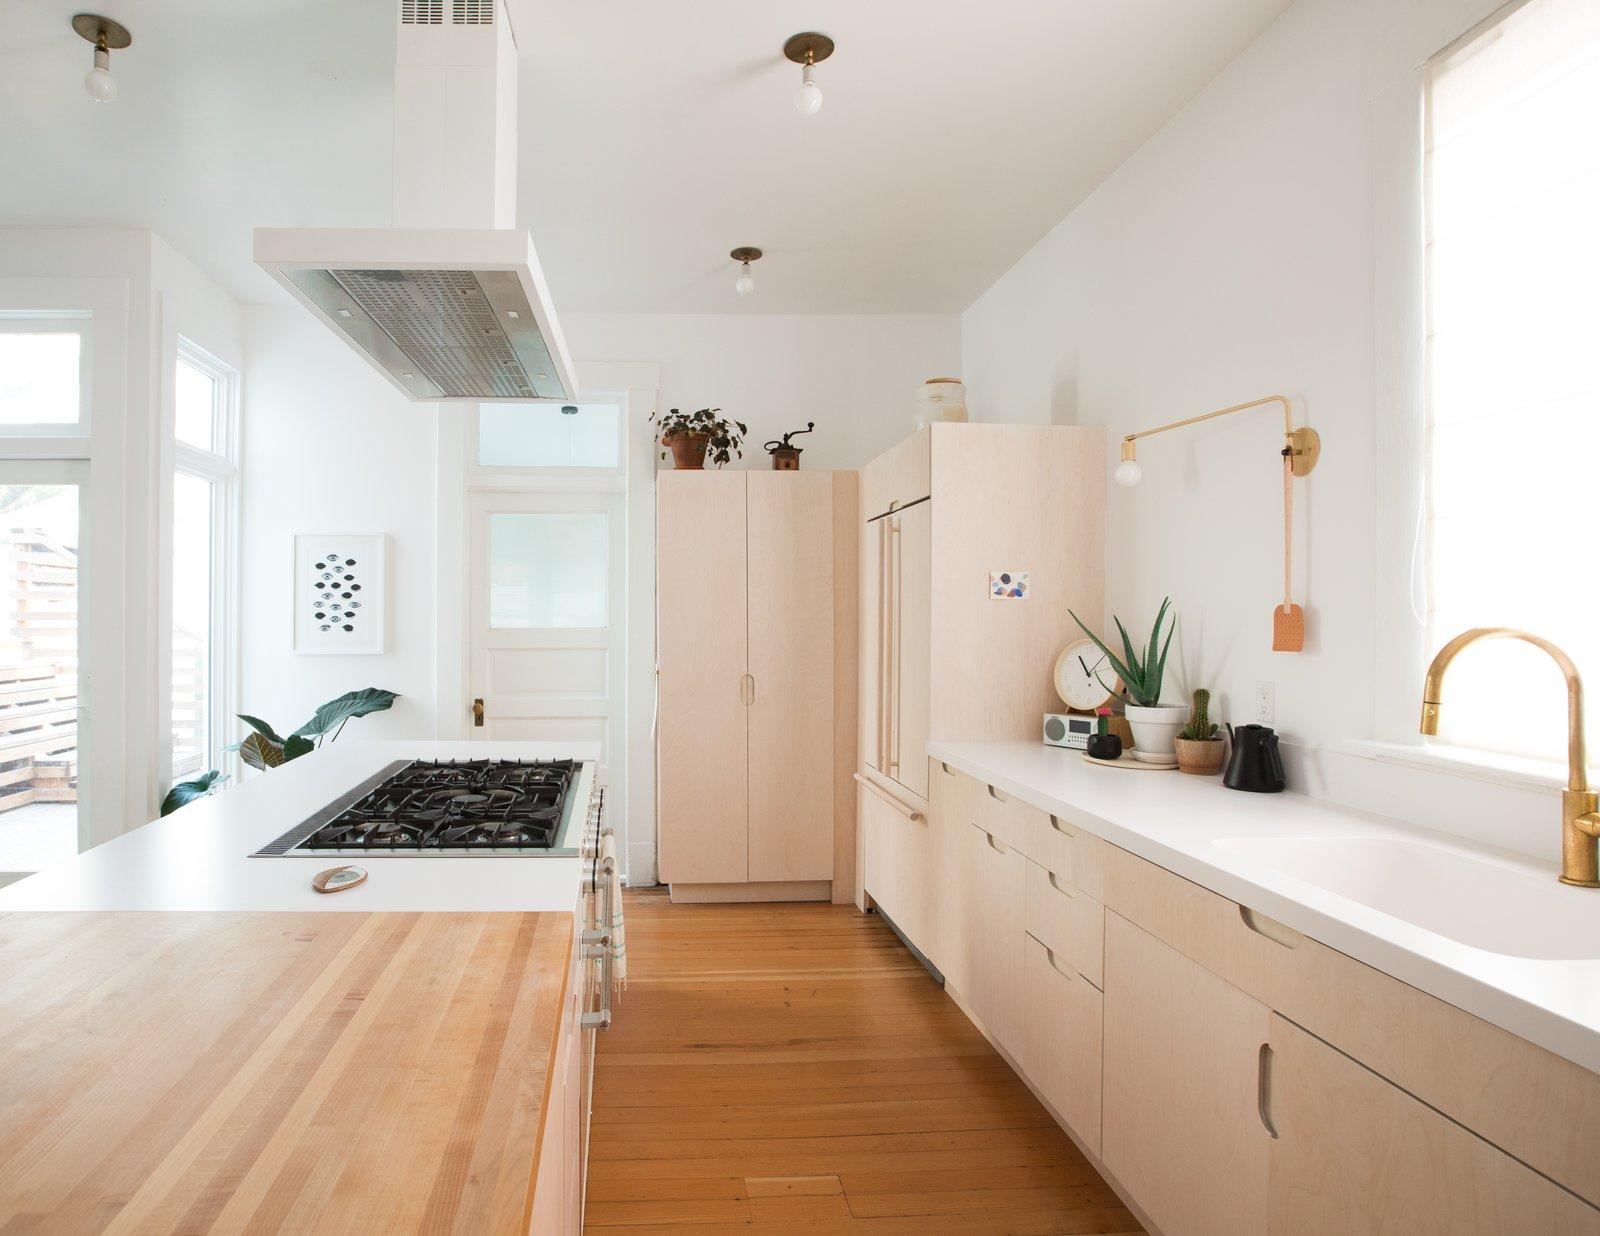 Carriage House by Medium Plenty kitchen